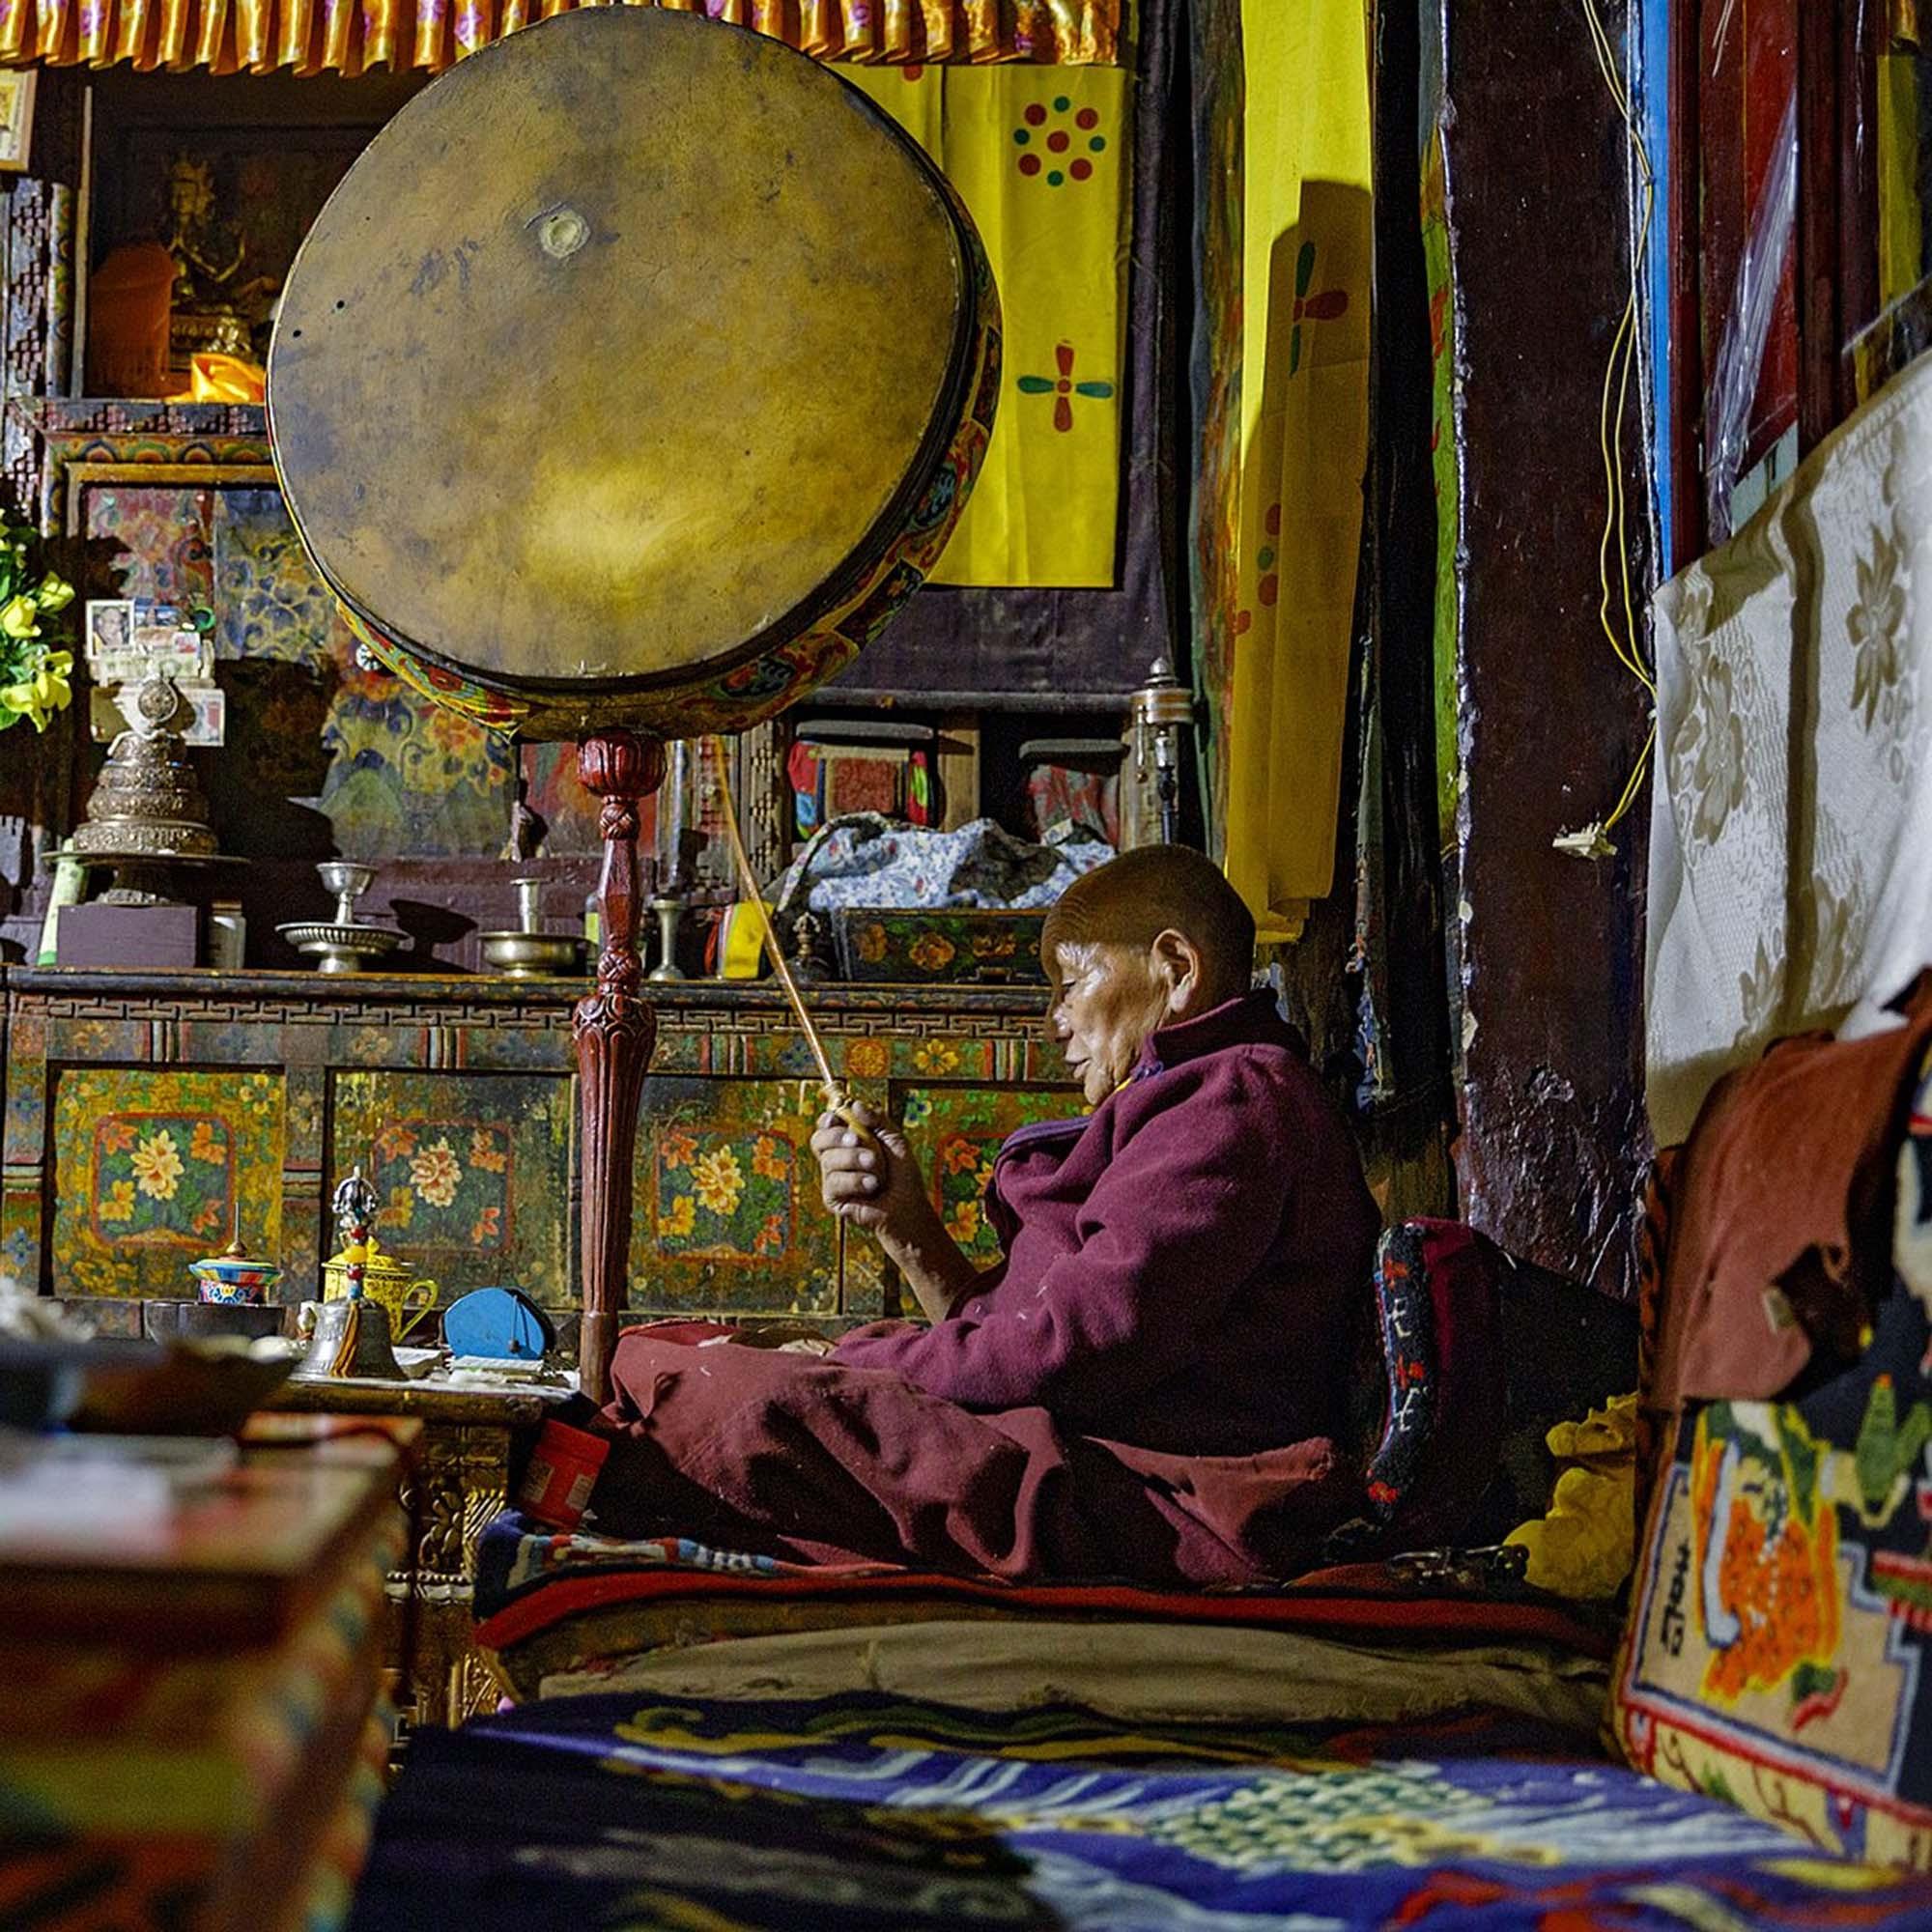 Tibetan monk reciting a sacred text, Mustang, Nepal